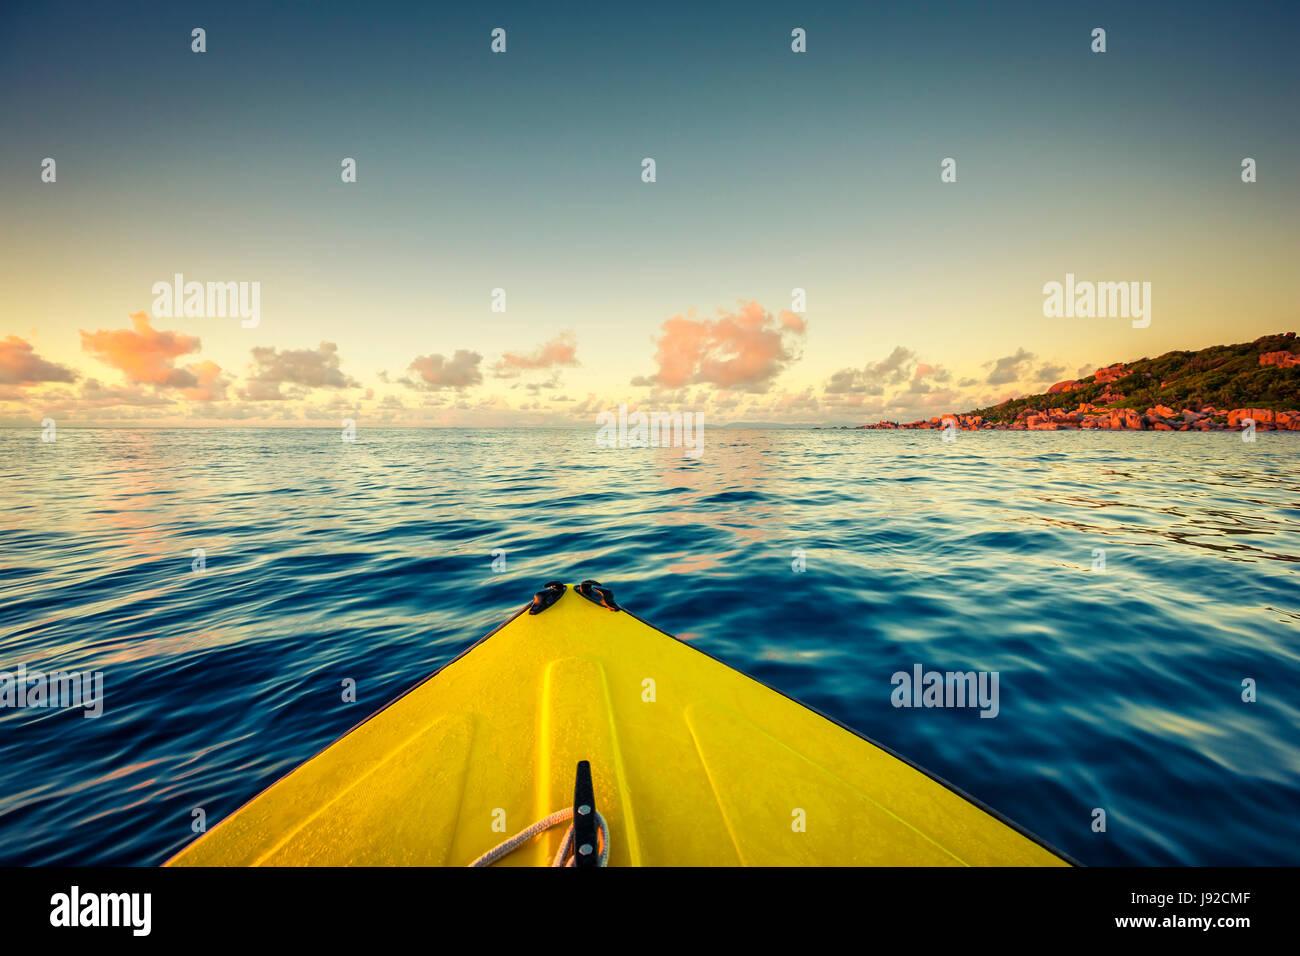 Navegar en barco amarillo cerca de Seychelles, La Digue island Foto de stock